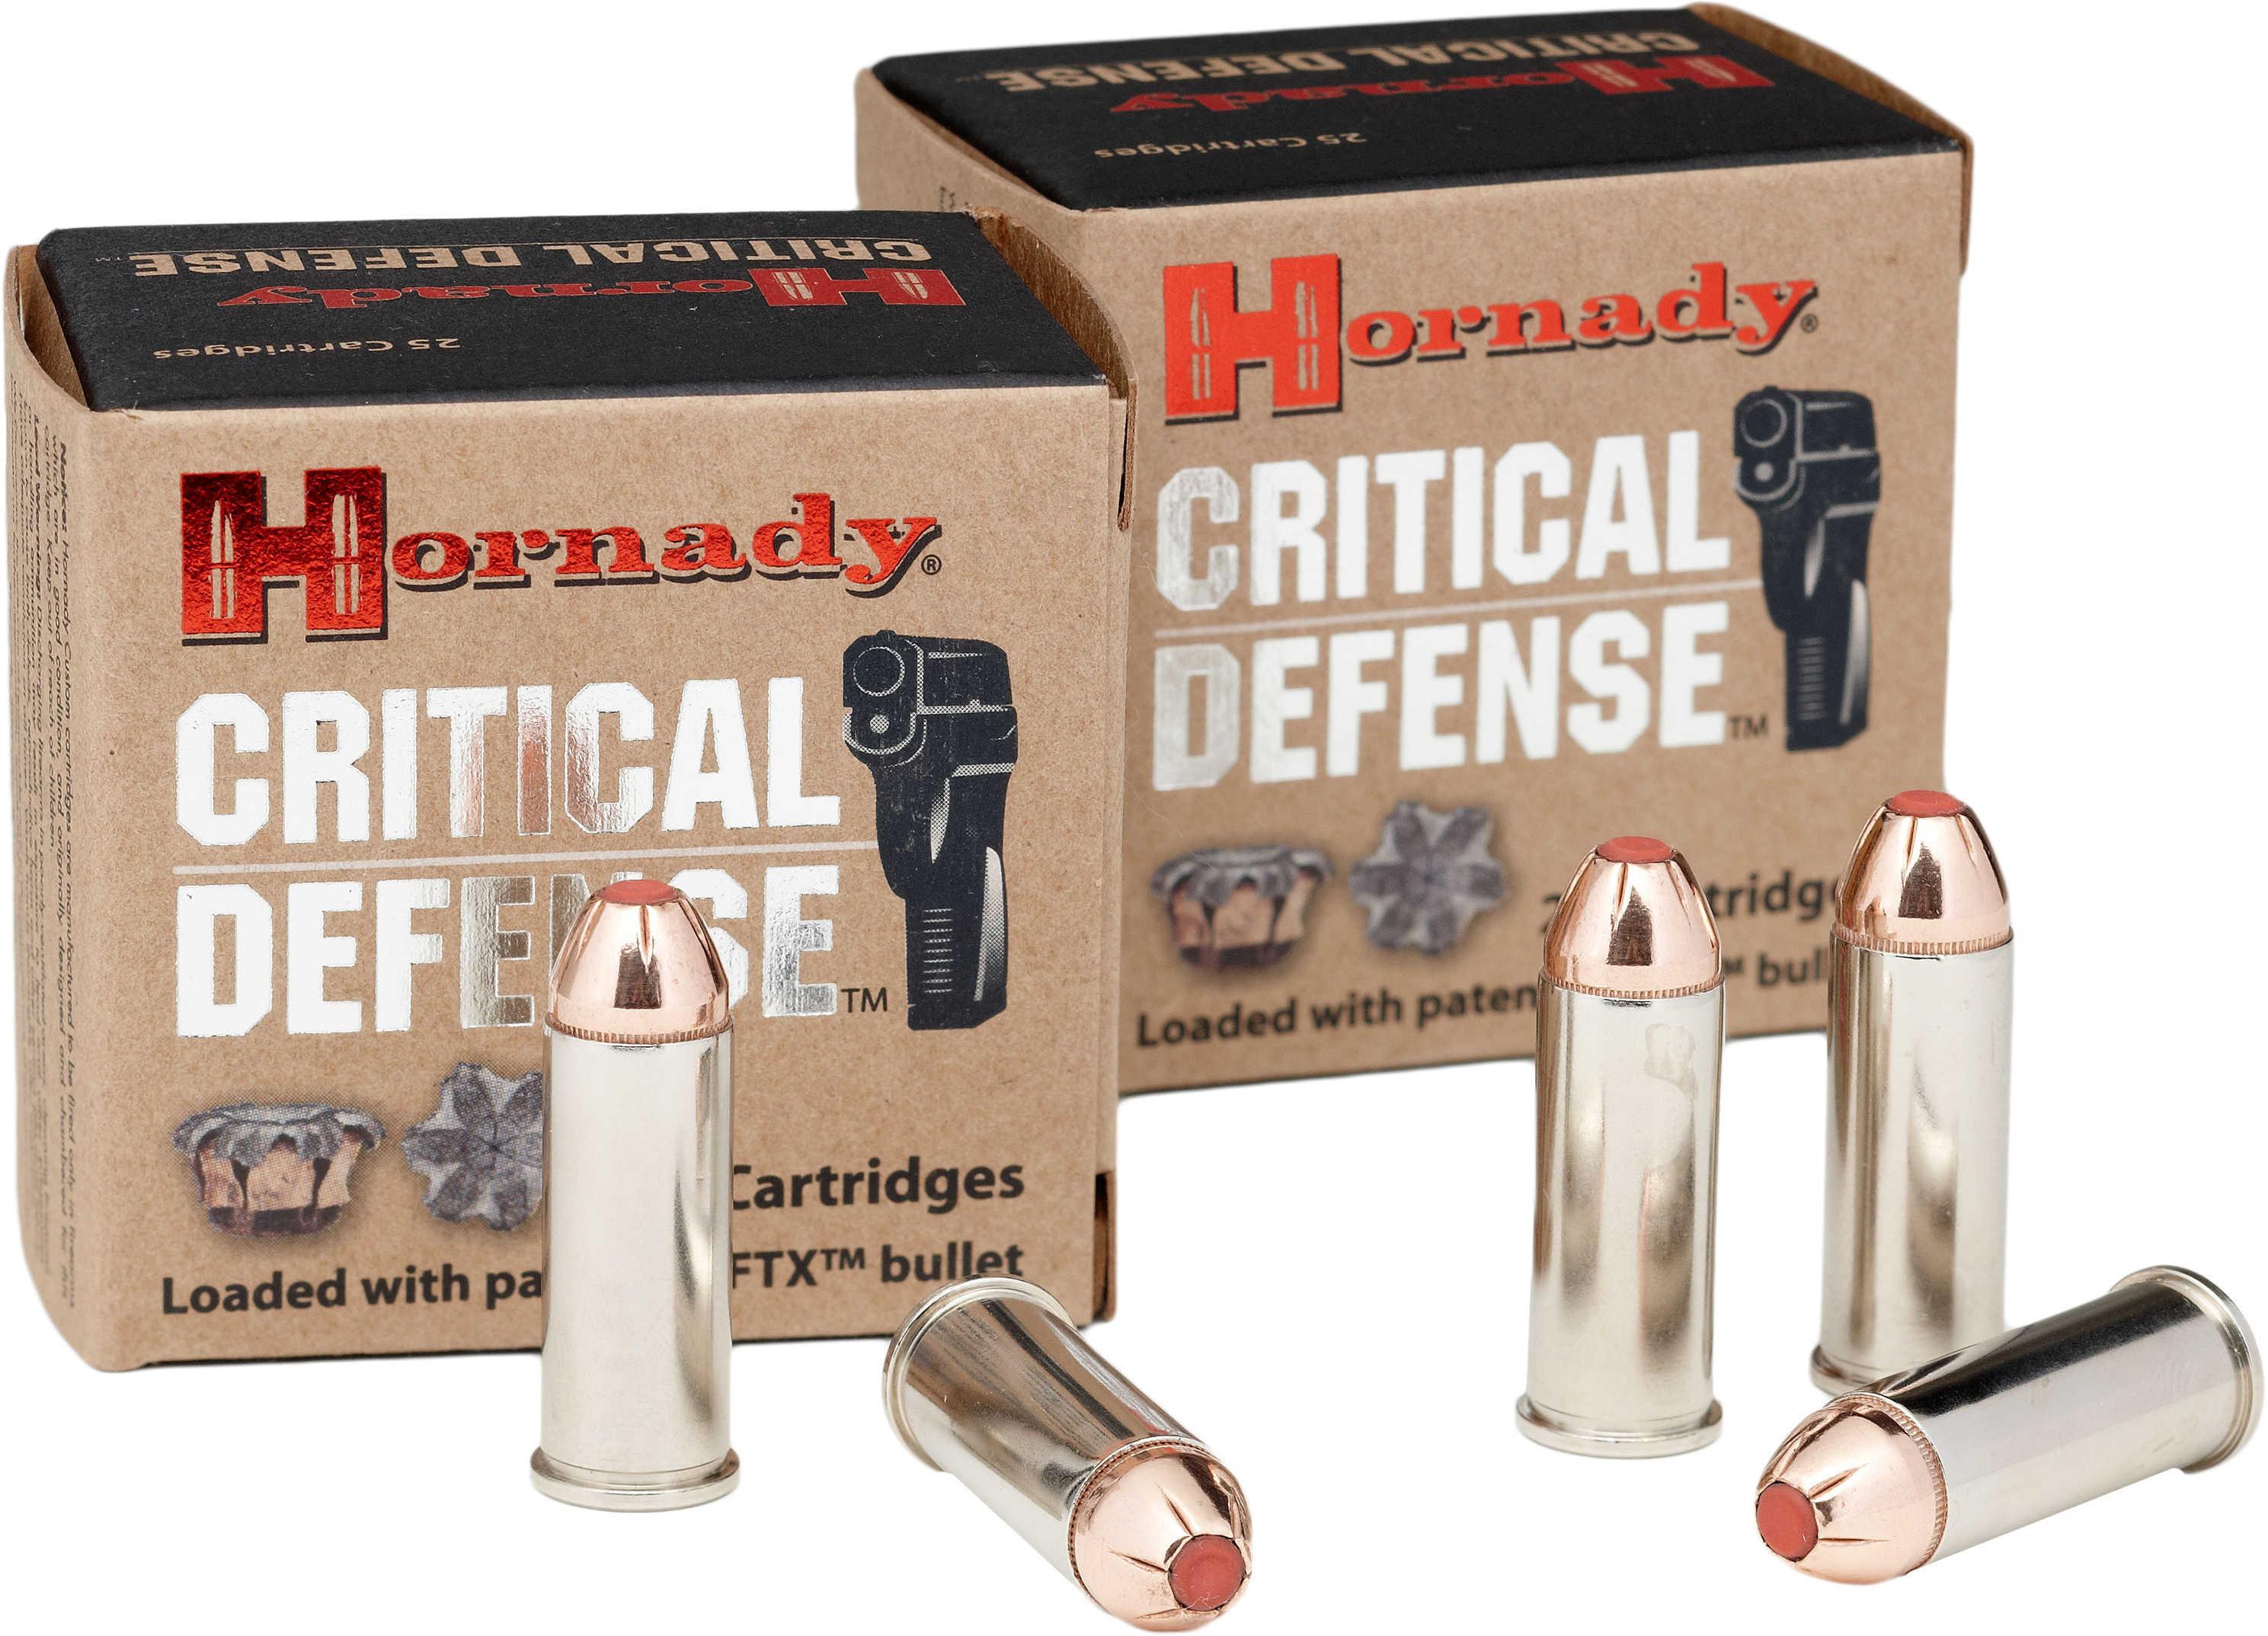 Hornady 44 Special 165 Grain FTX Critical Defense (Per 20 Rounds) Md: 90700 Ammunition